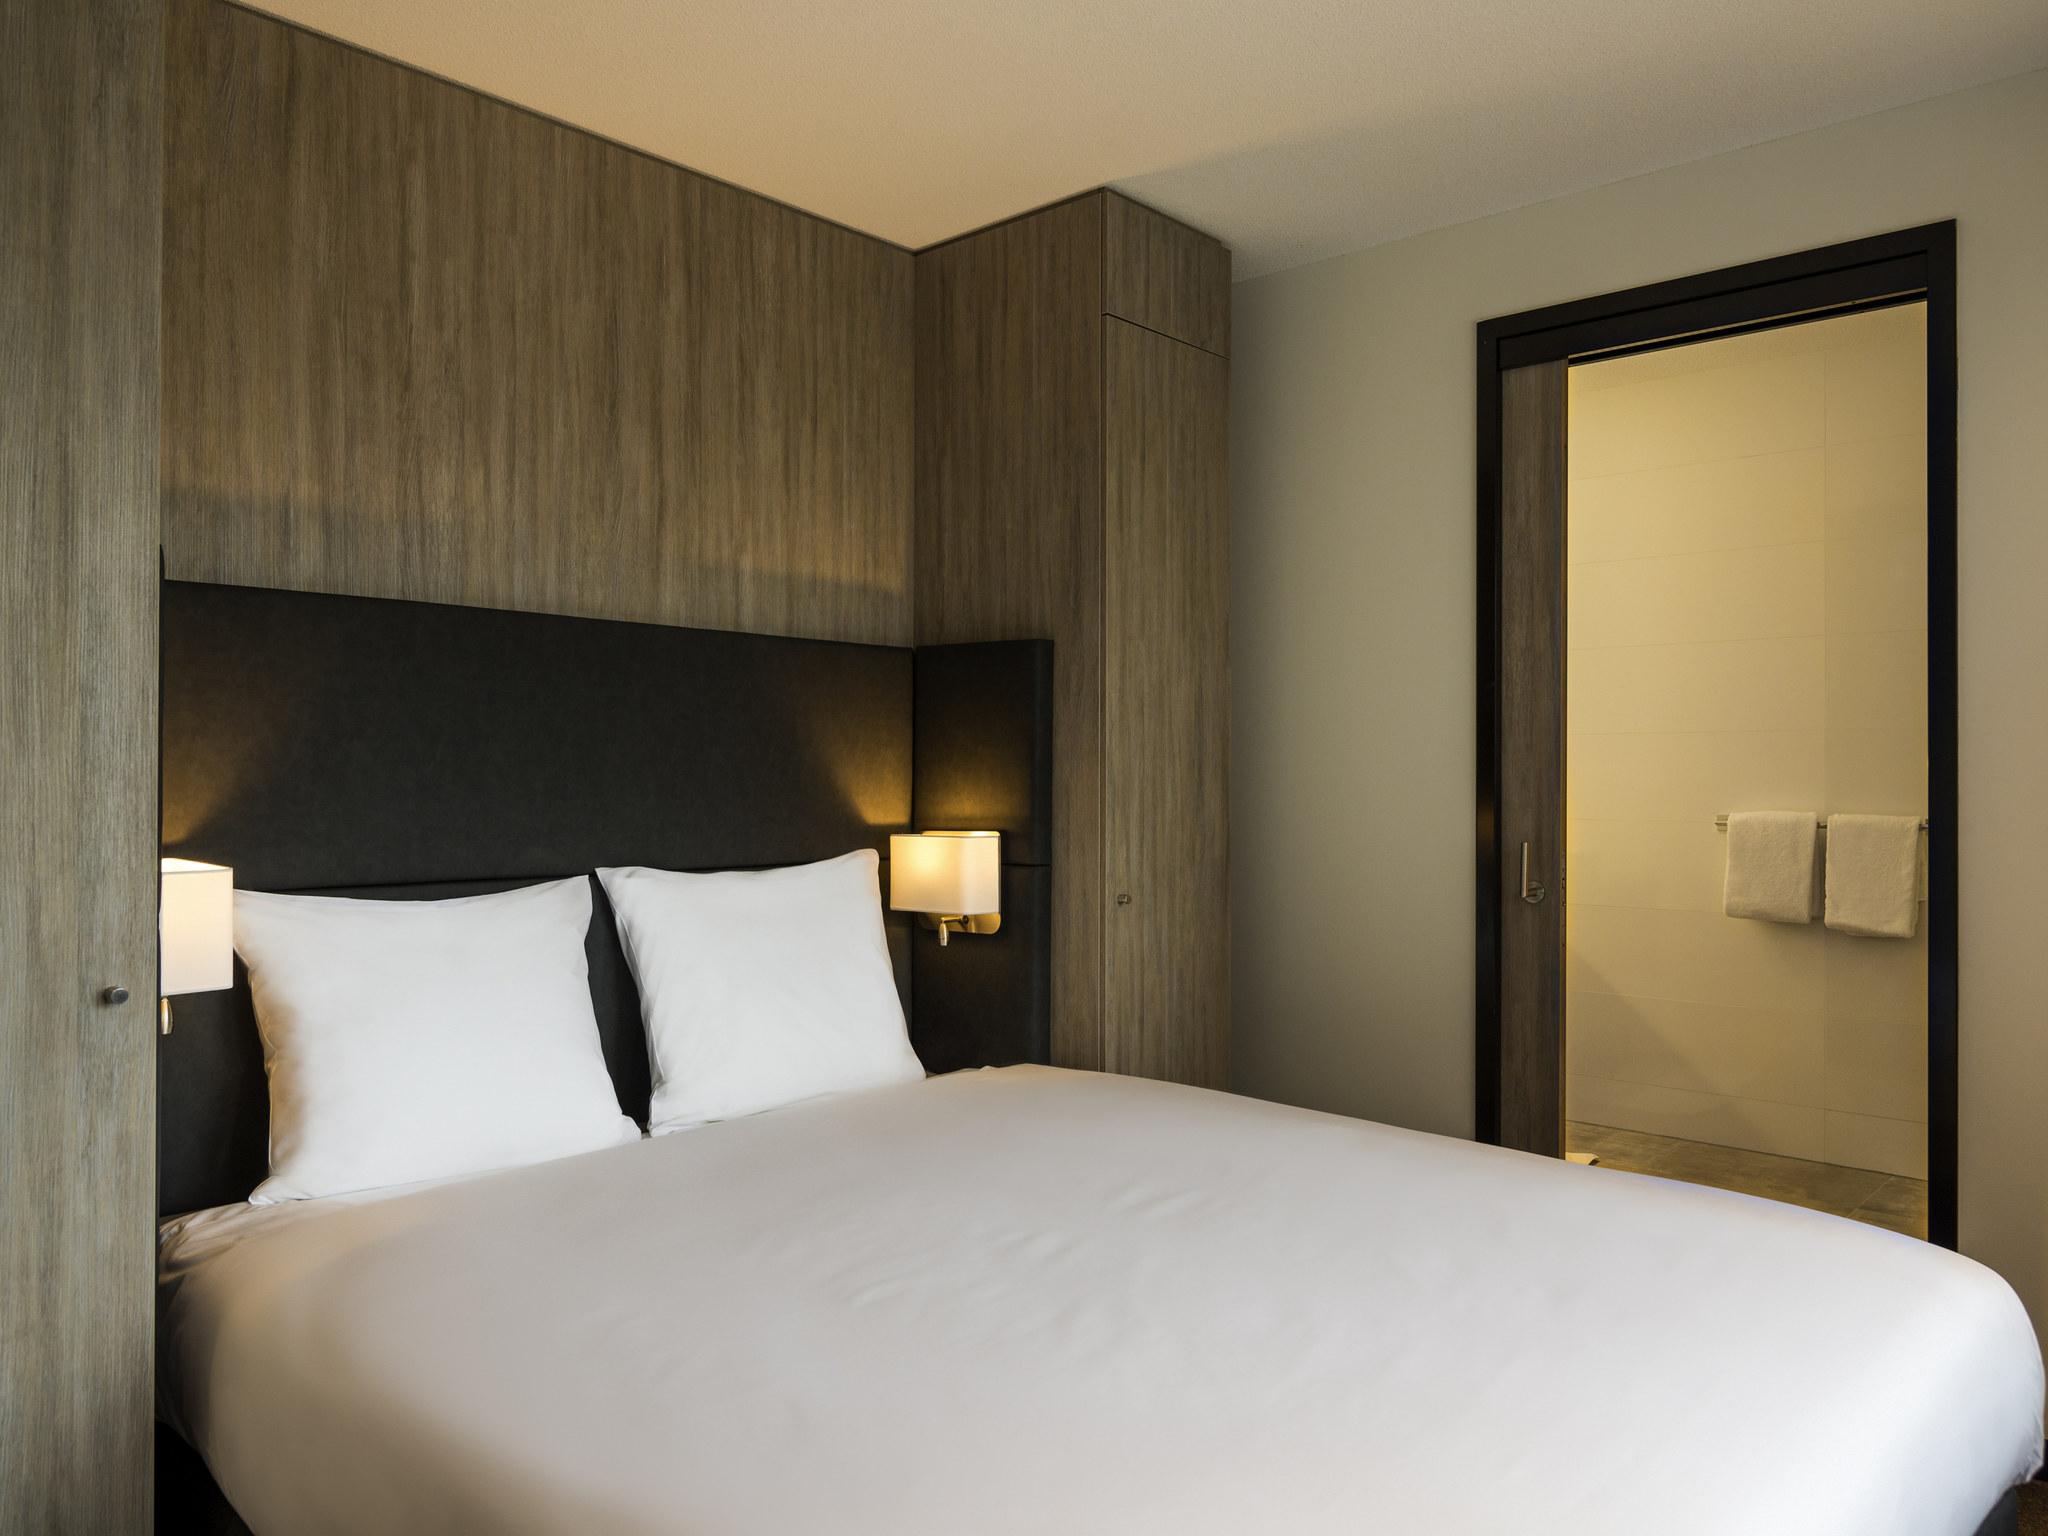 B Apart Hotel Amsterdam